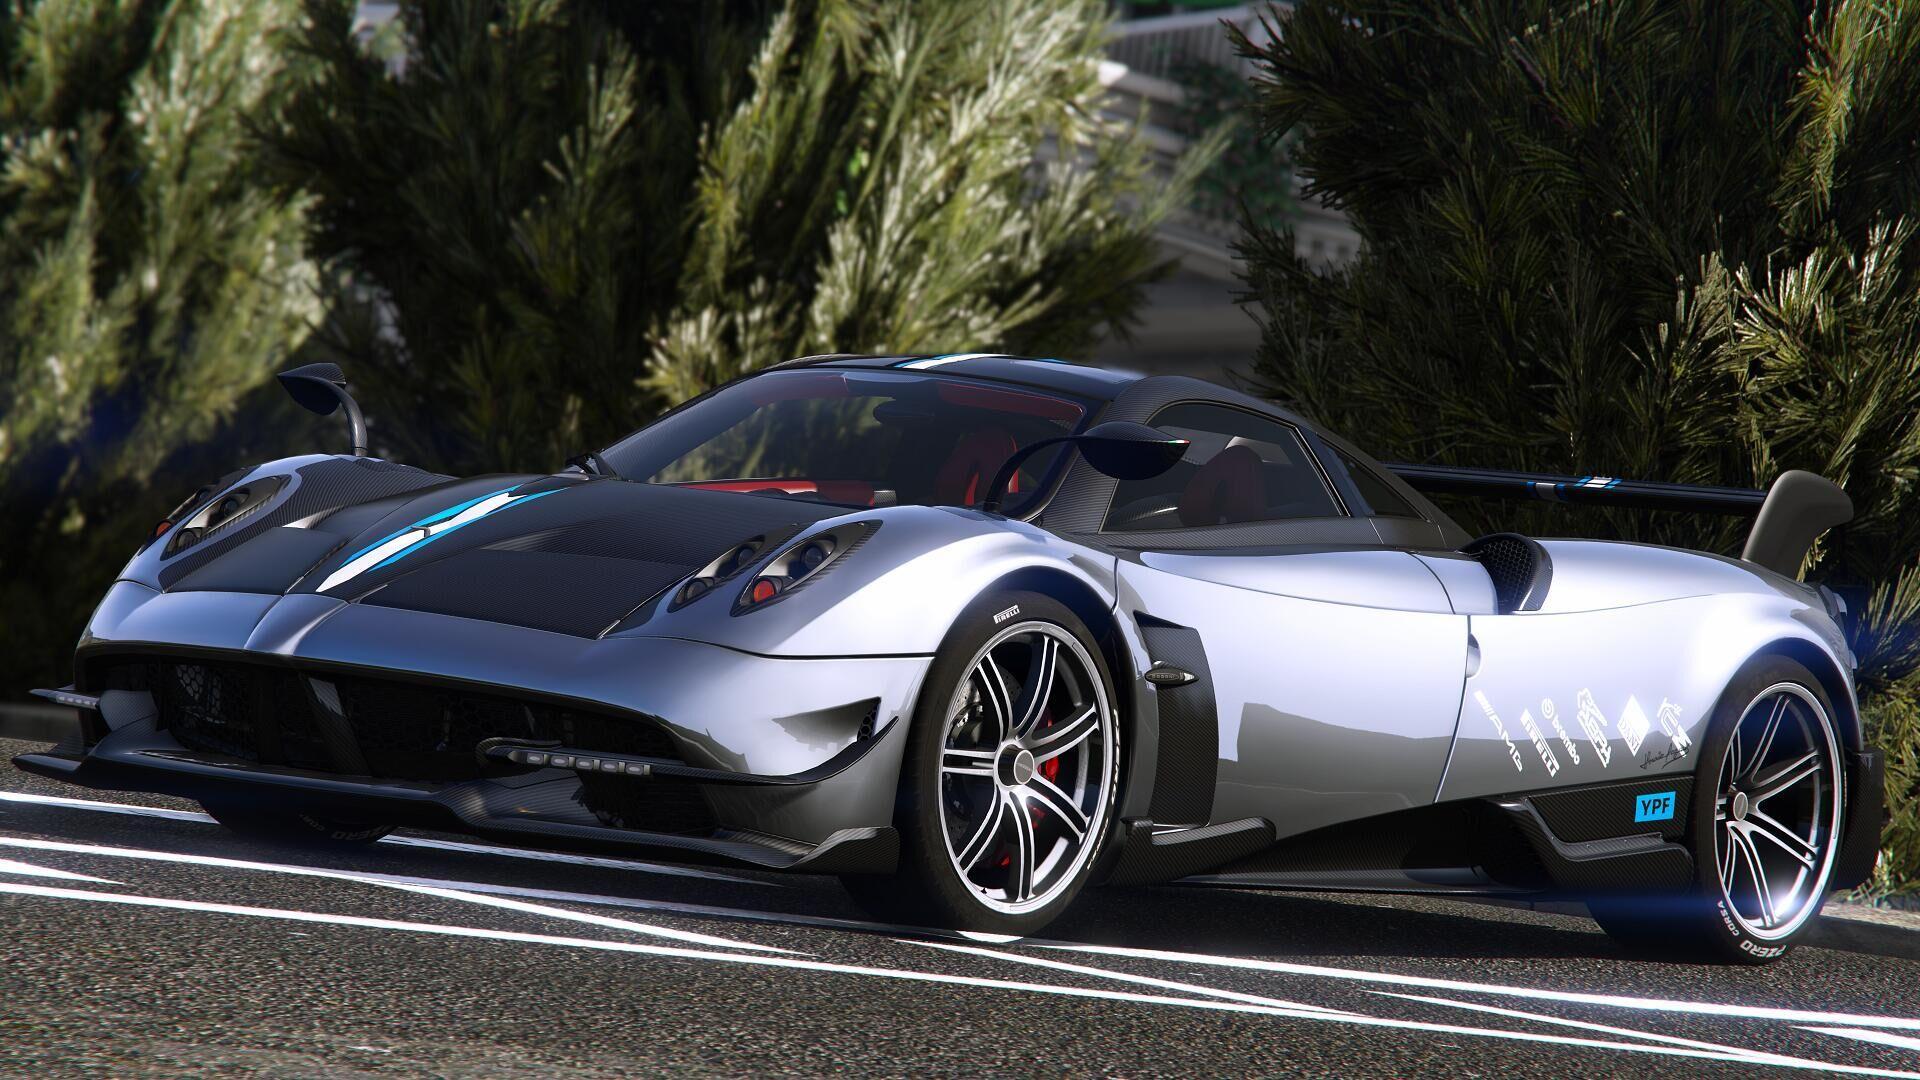 Dodge Aero >> 2016 Pagani Huayra BC [Aero Flaps] - GTA5-Mods.com